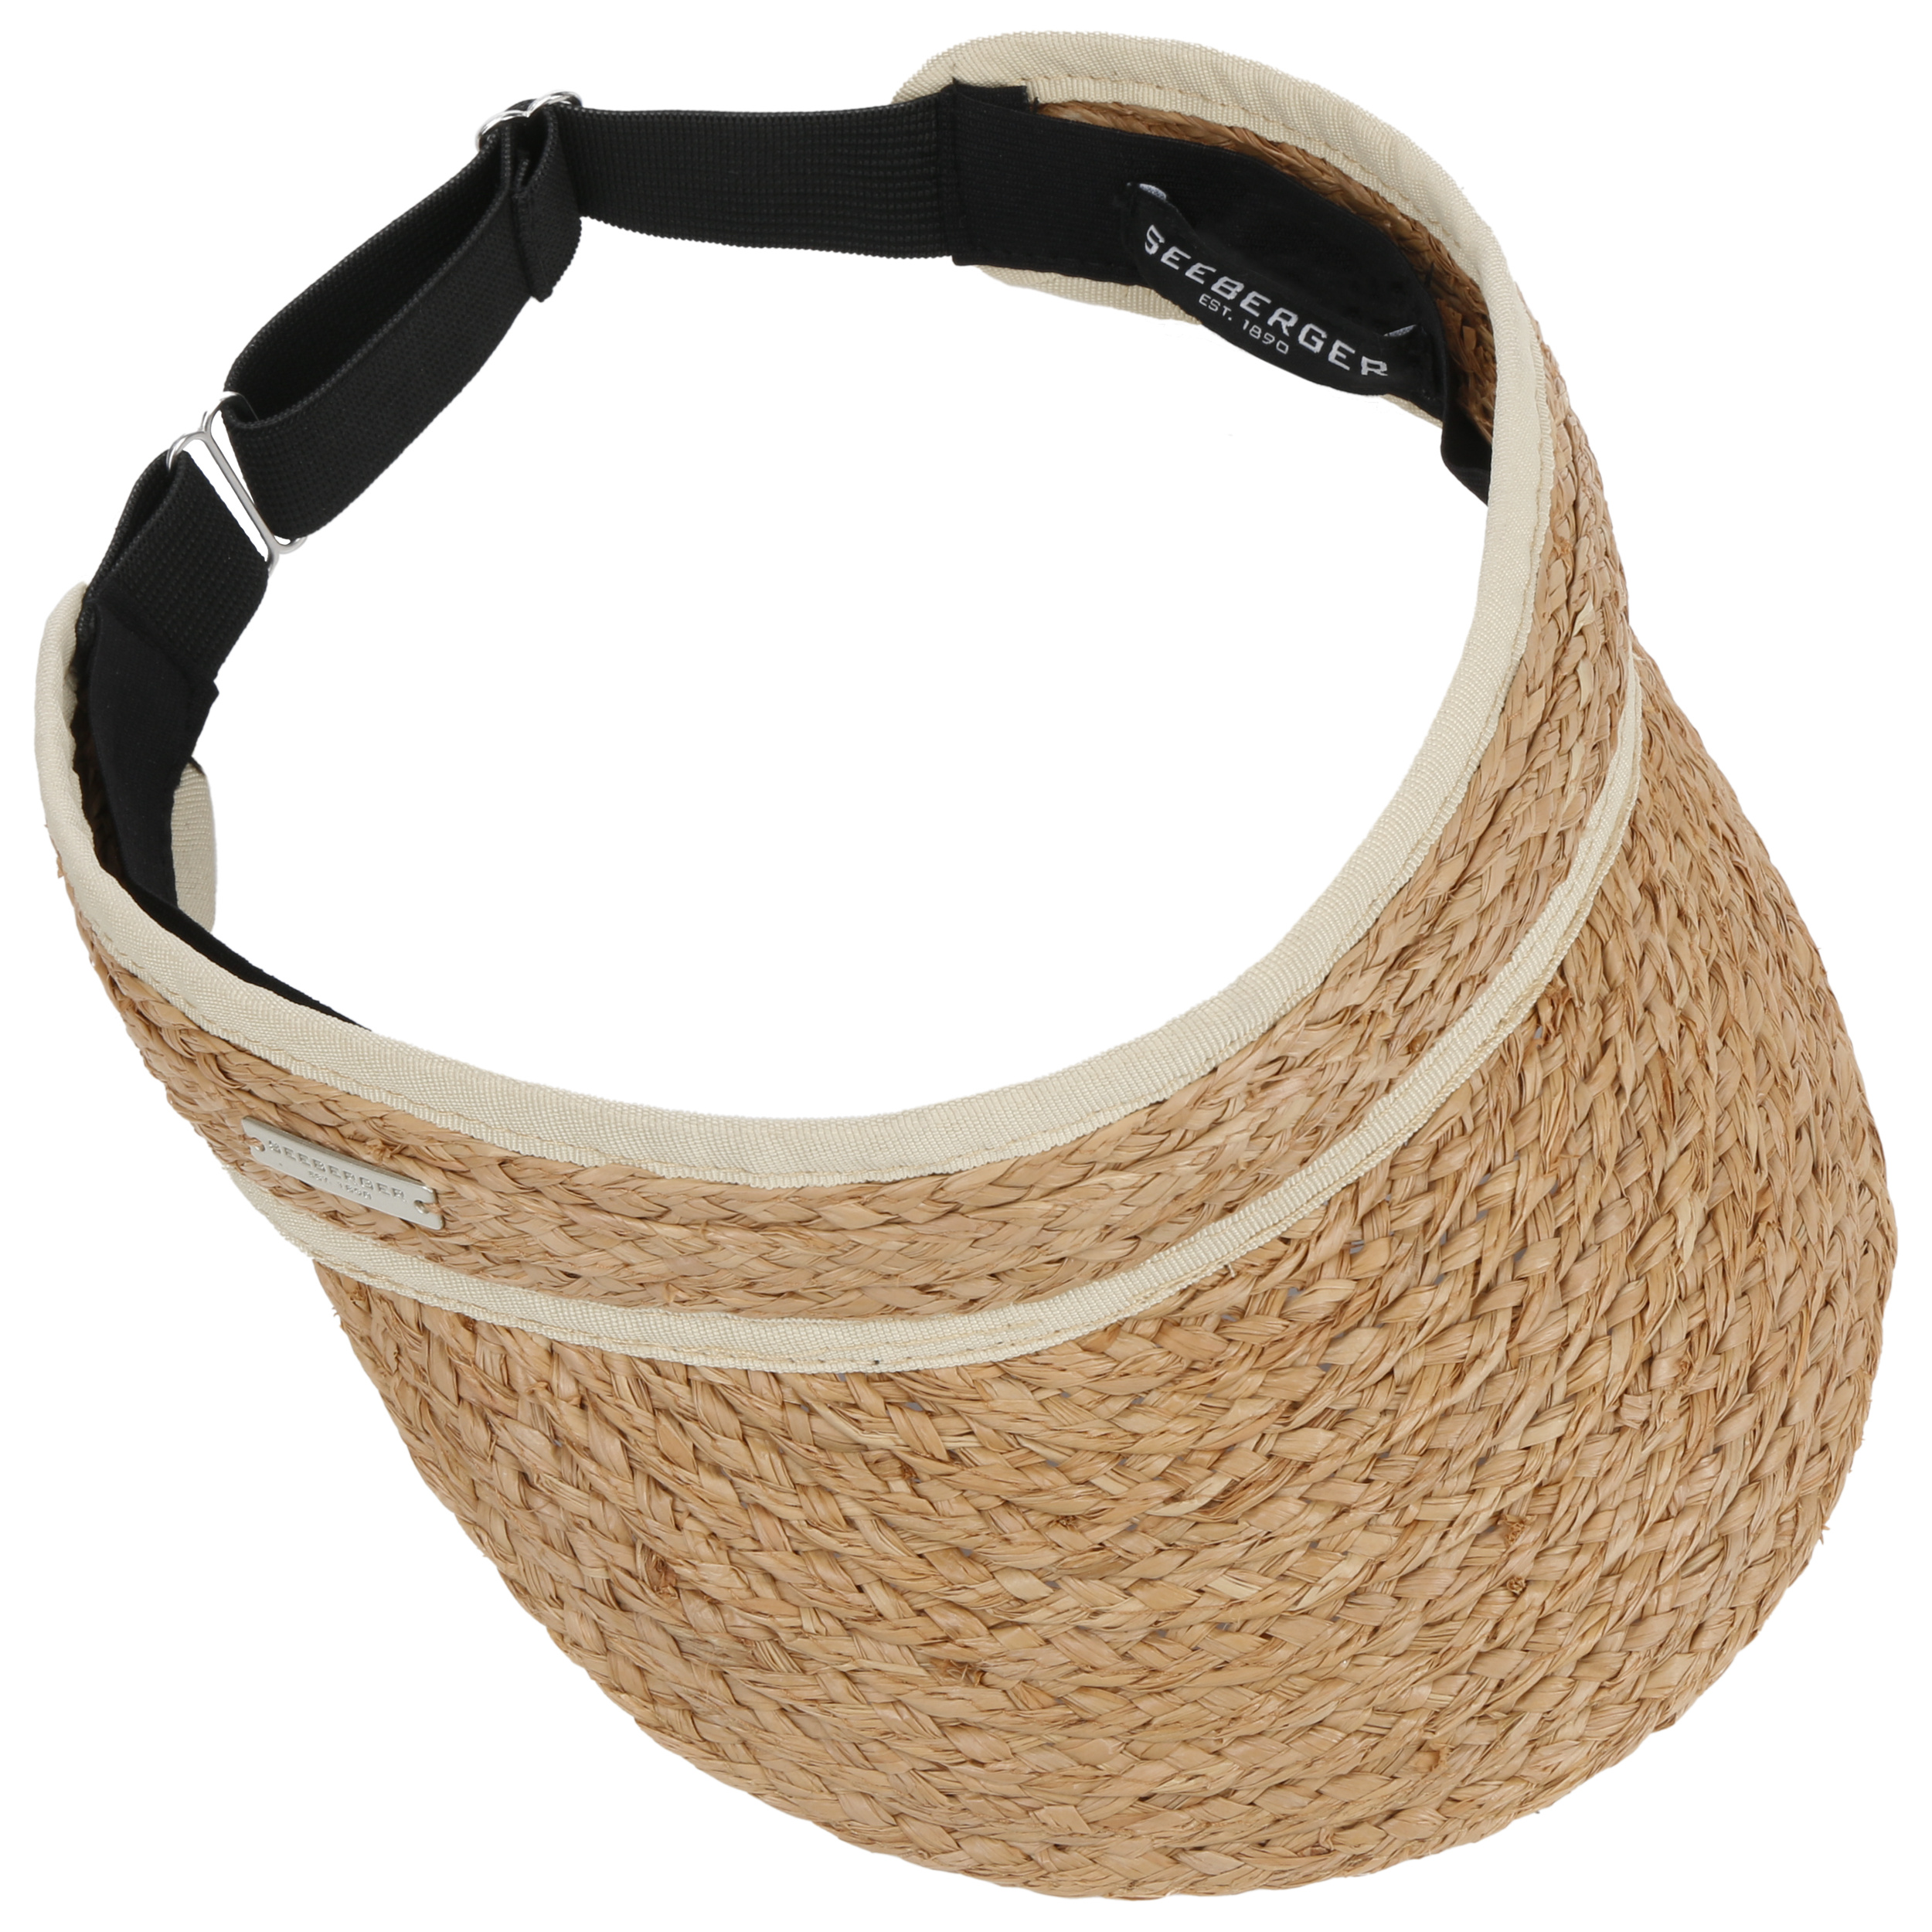 Visera Rafia by Seeberger - Gorras - sombreroshop.es bfba0b7e83b